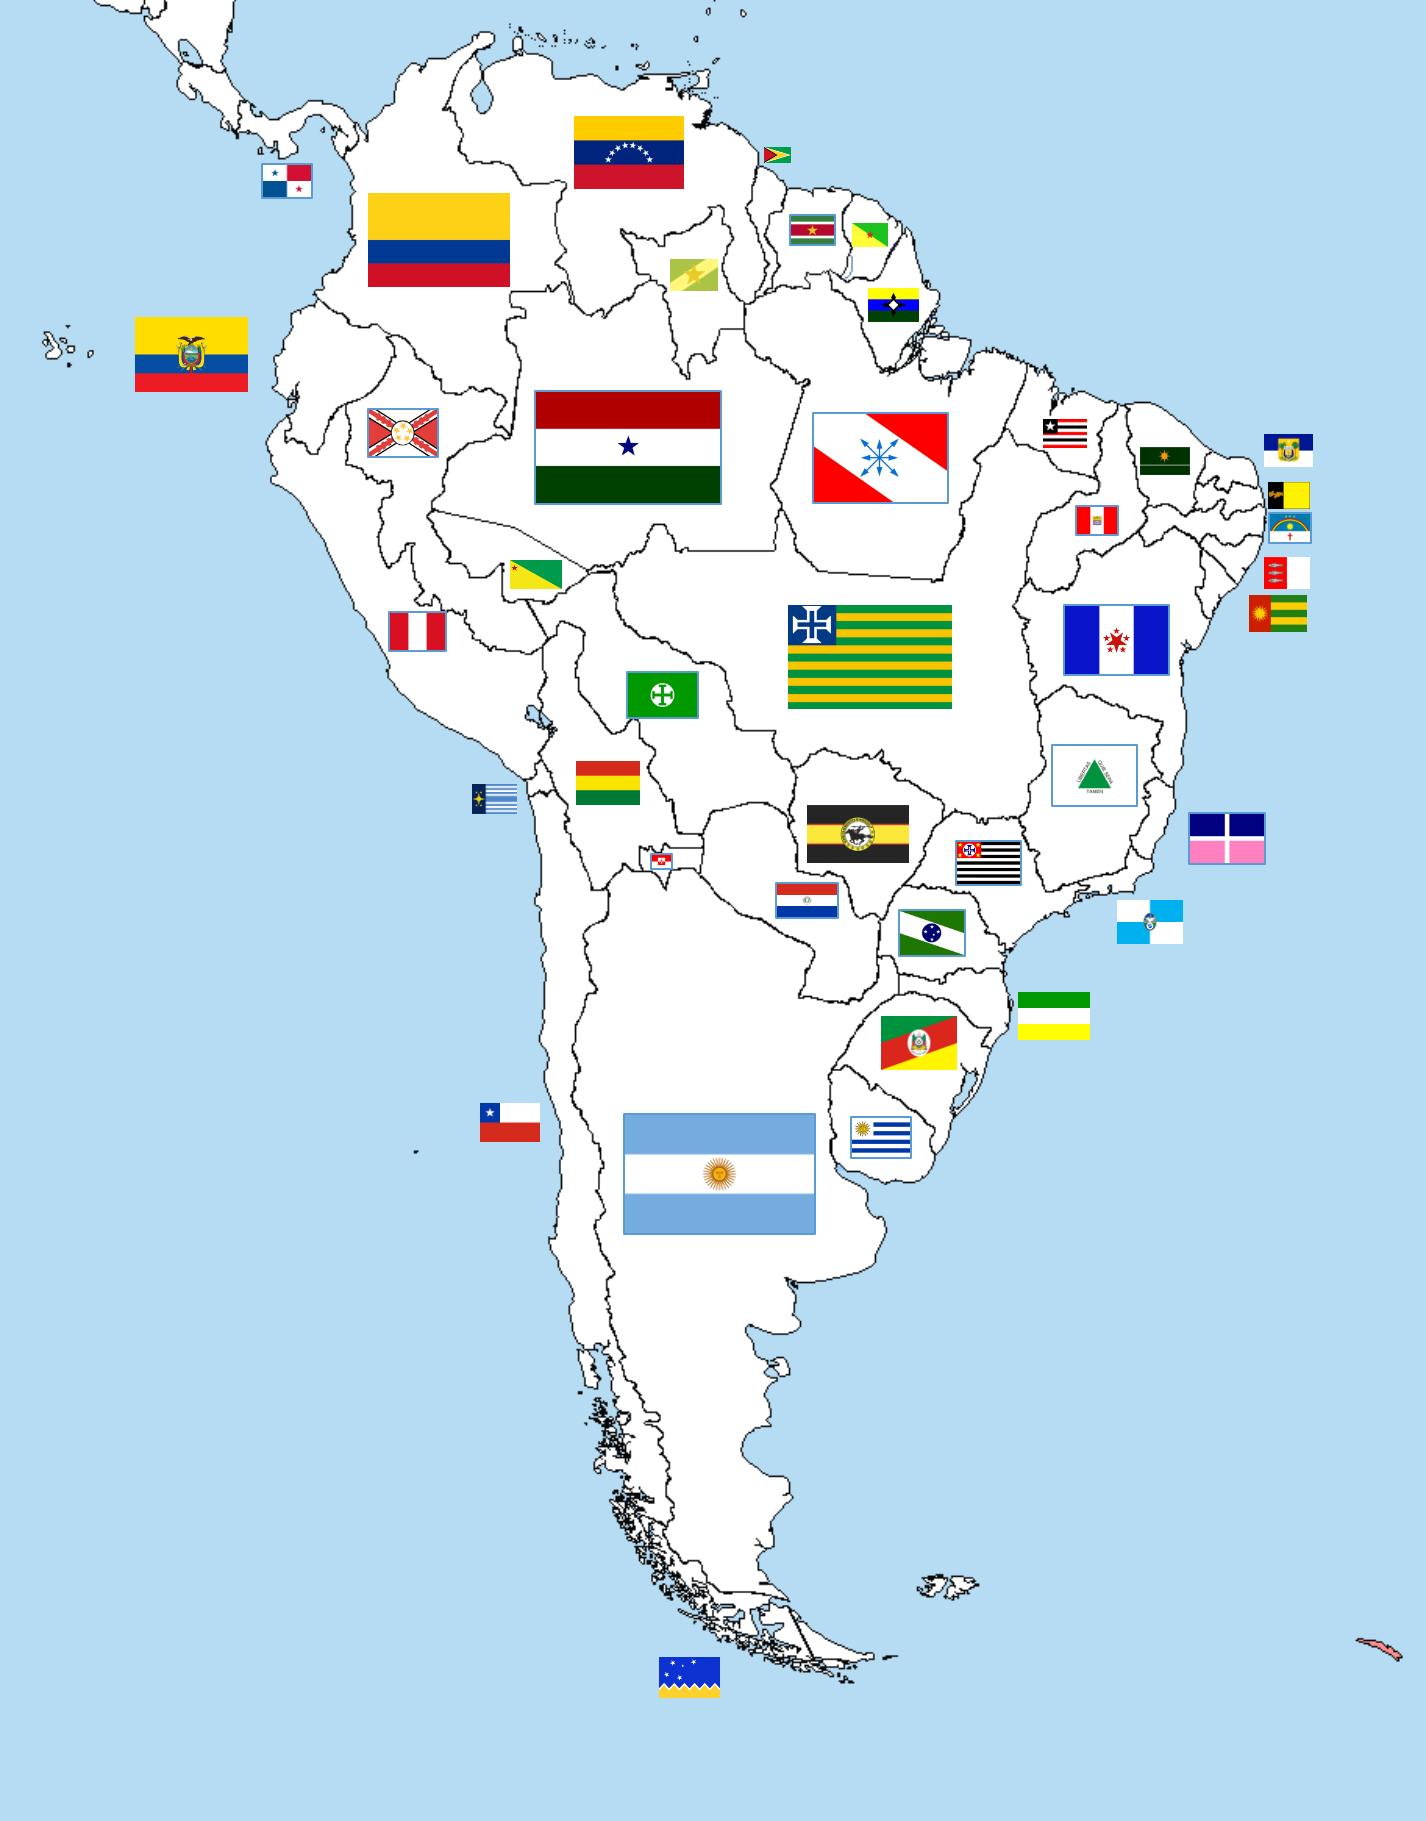 Imagen - Mapa sur america (Los Paises Inviables de la Ola ...